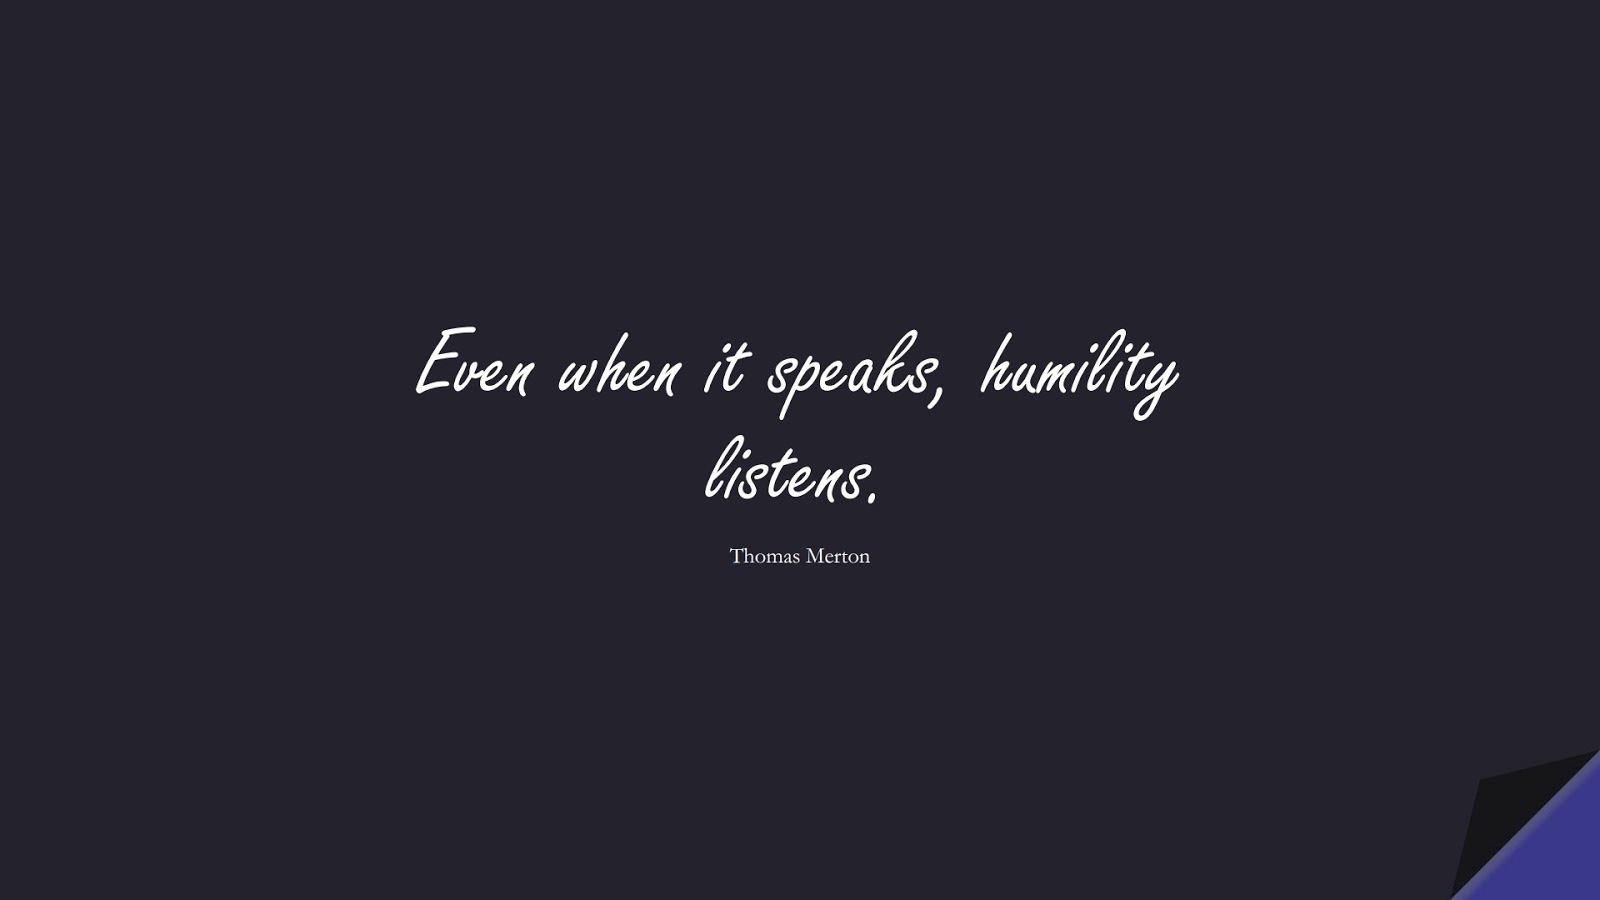 Even when it speaks, humility listens. (Thomas Merton);  #SelfEsteemQuotes